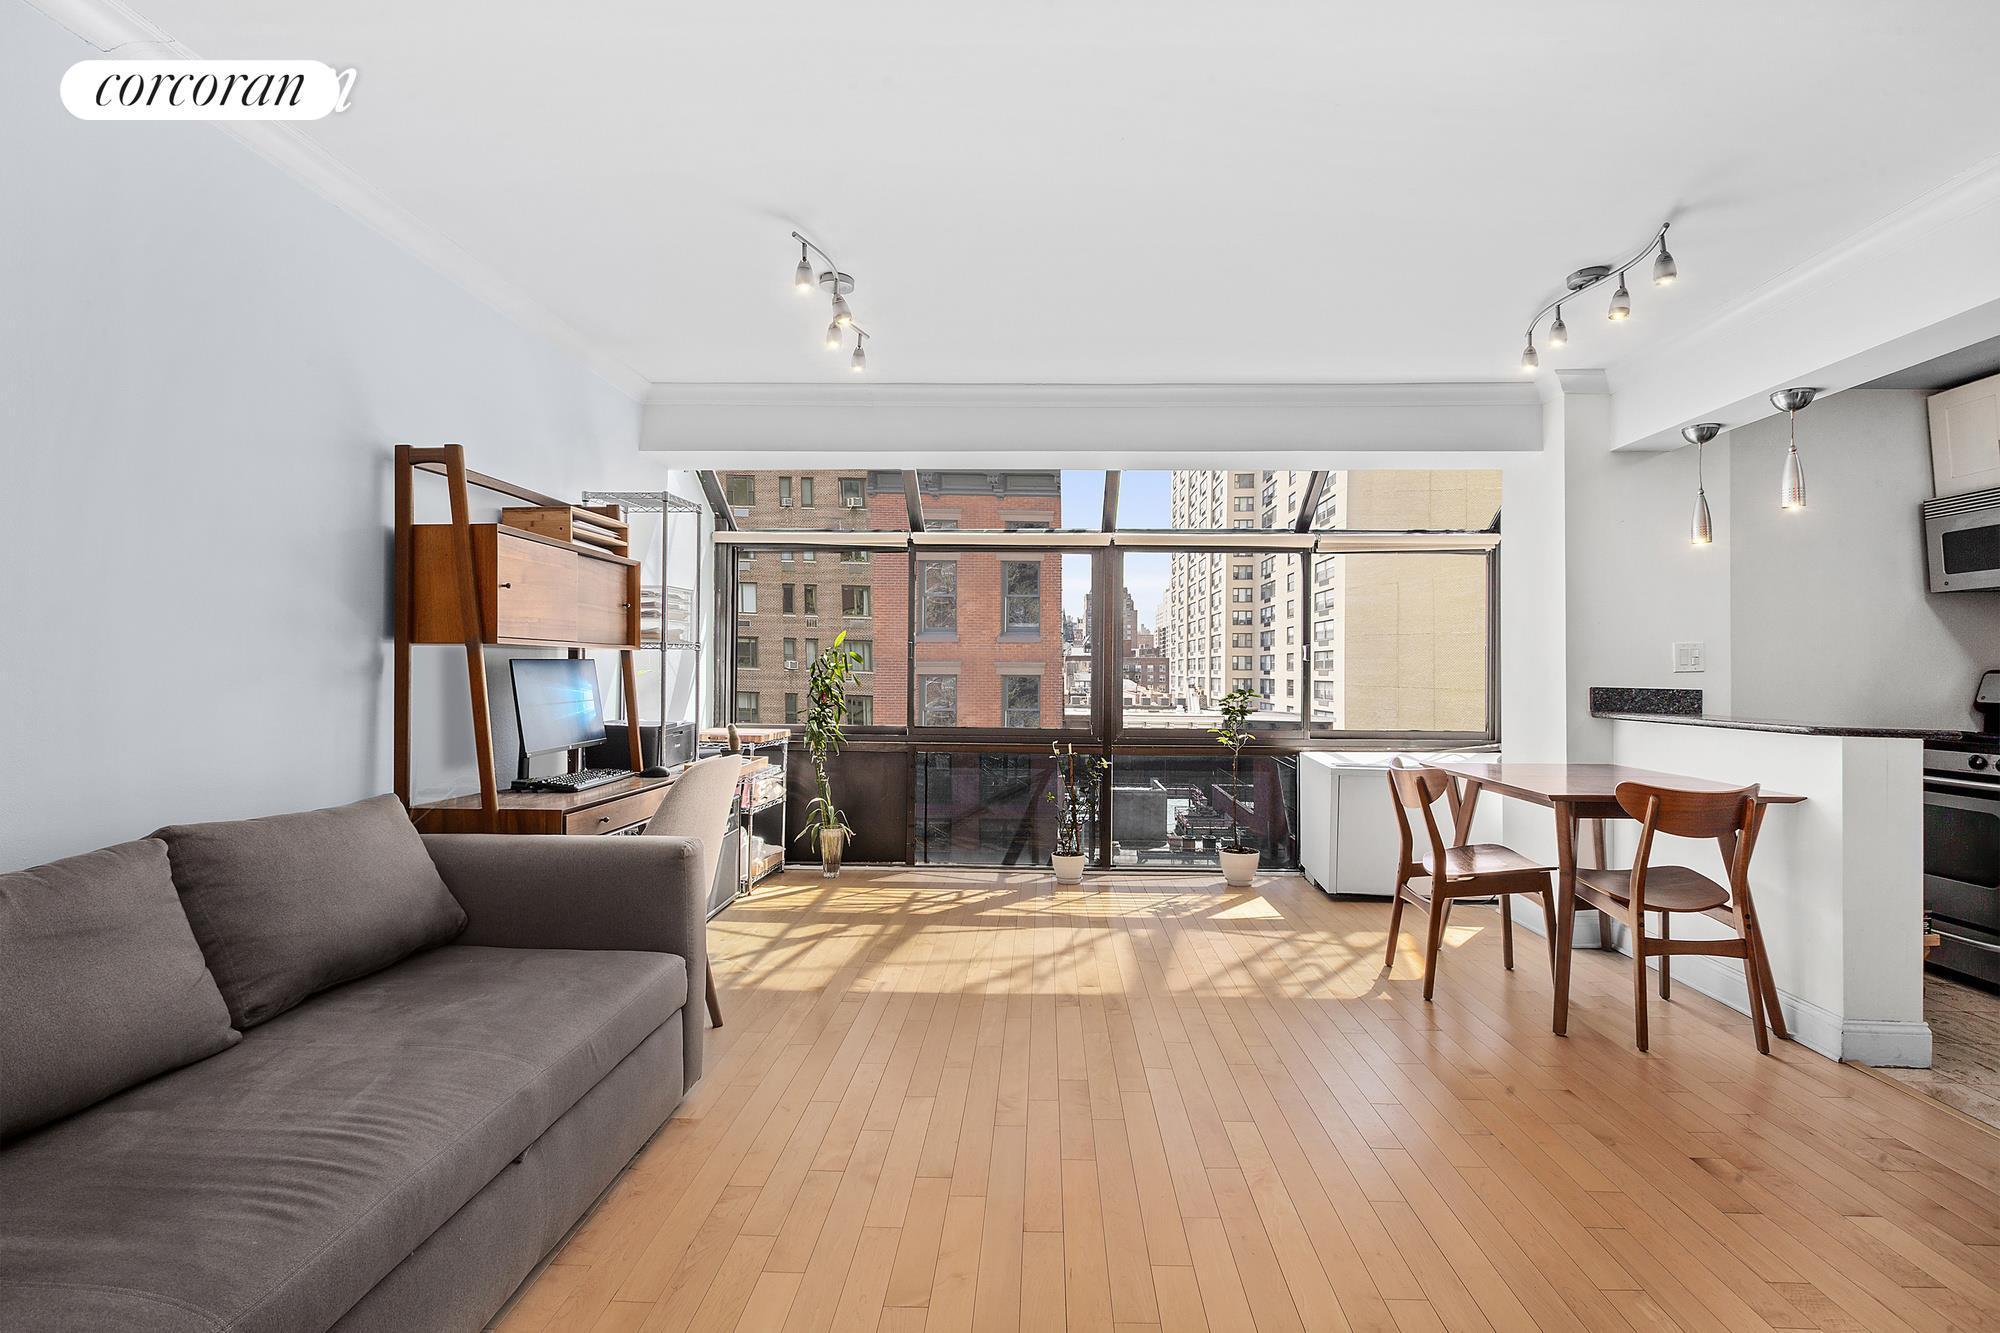 225 East 86th Street Upper East Side New York NY 10028